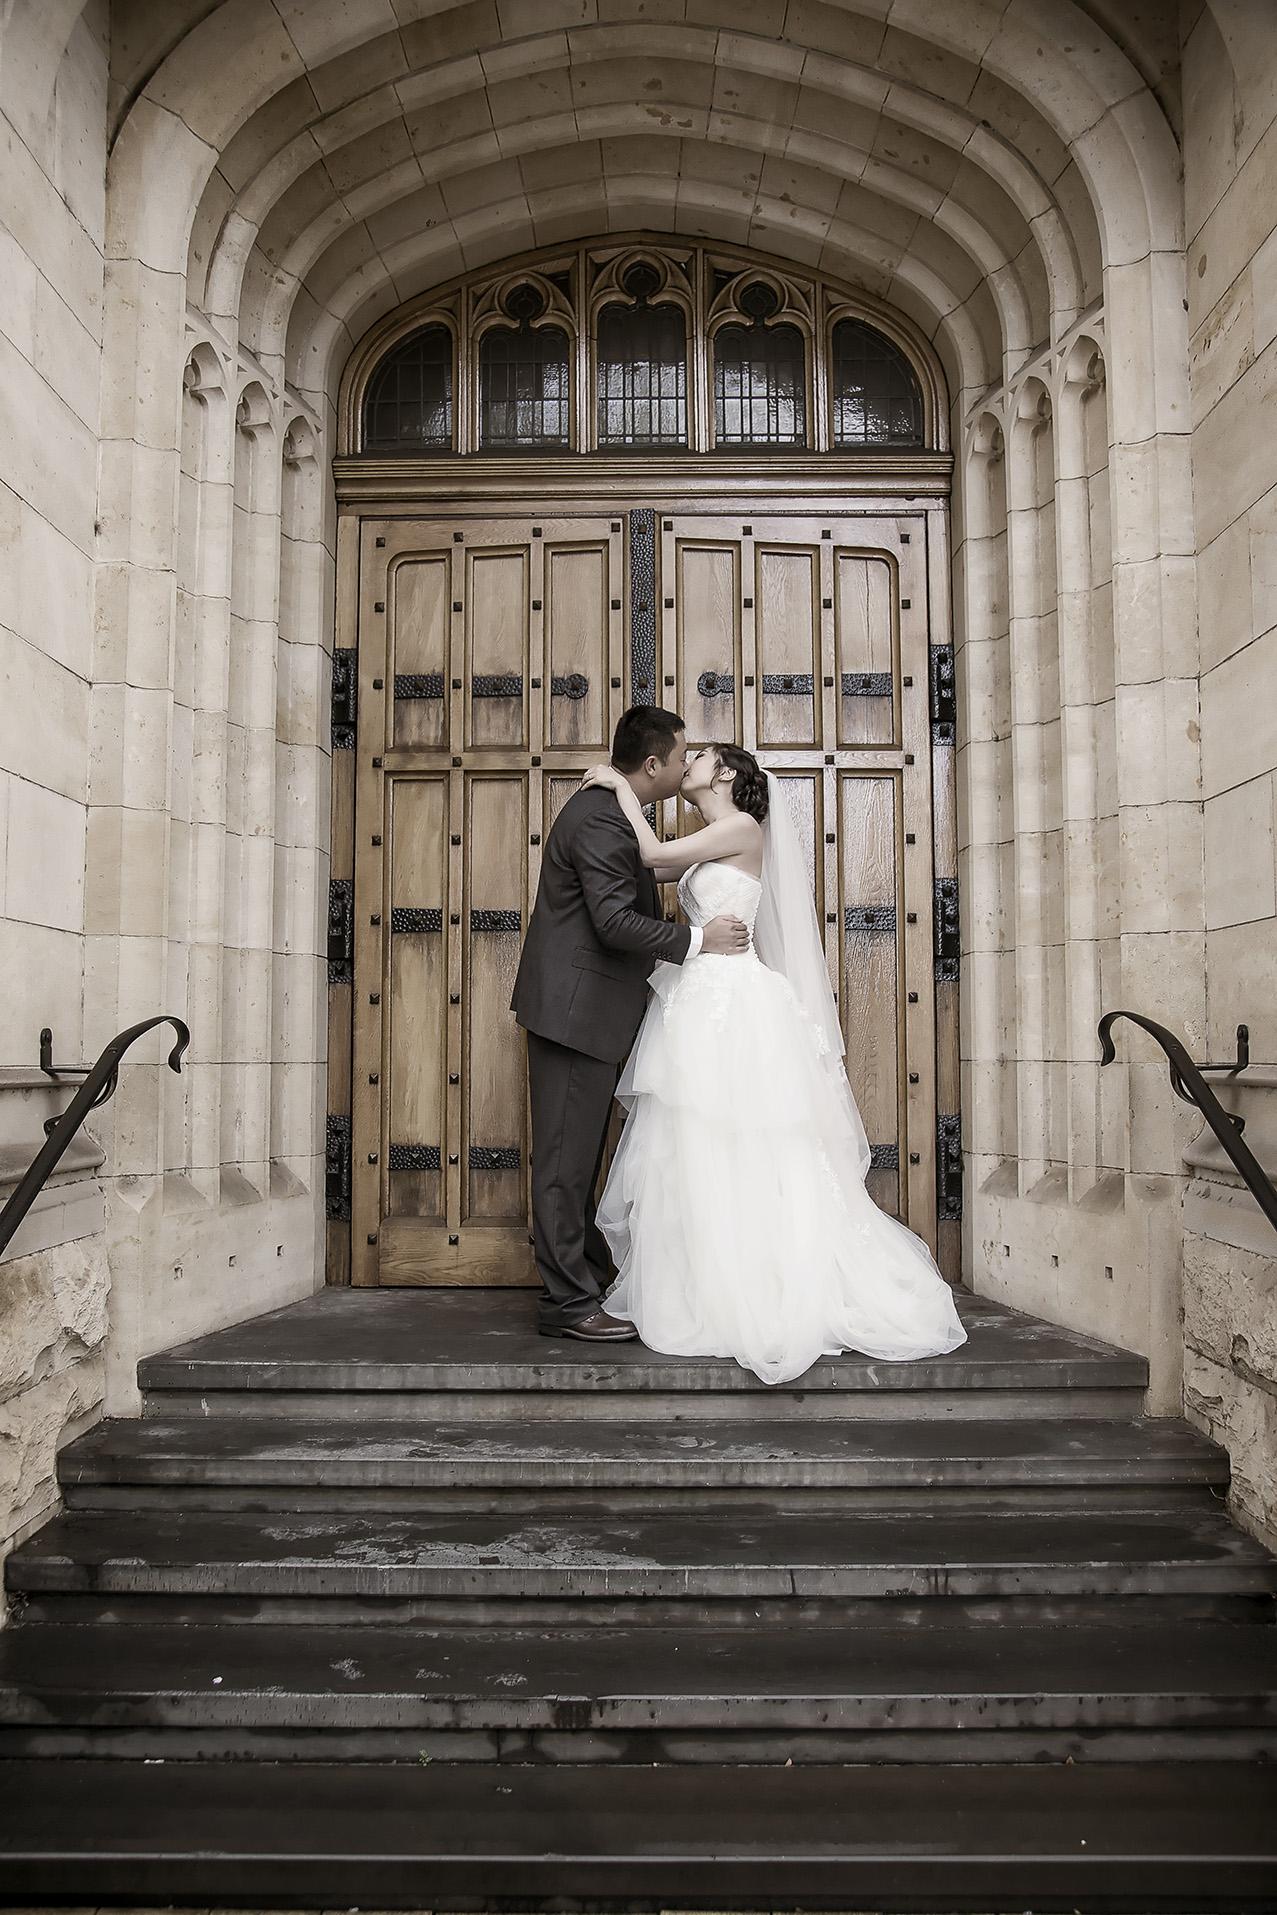 Adelaide University Wedding Portraits sepia film style